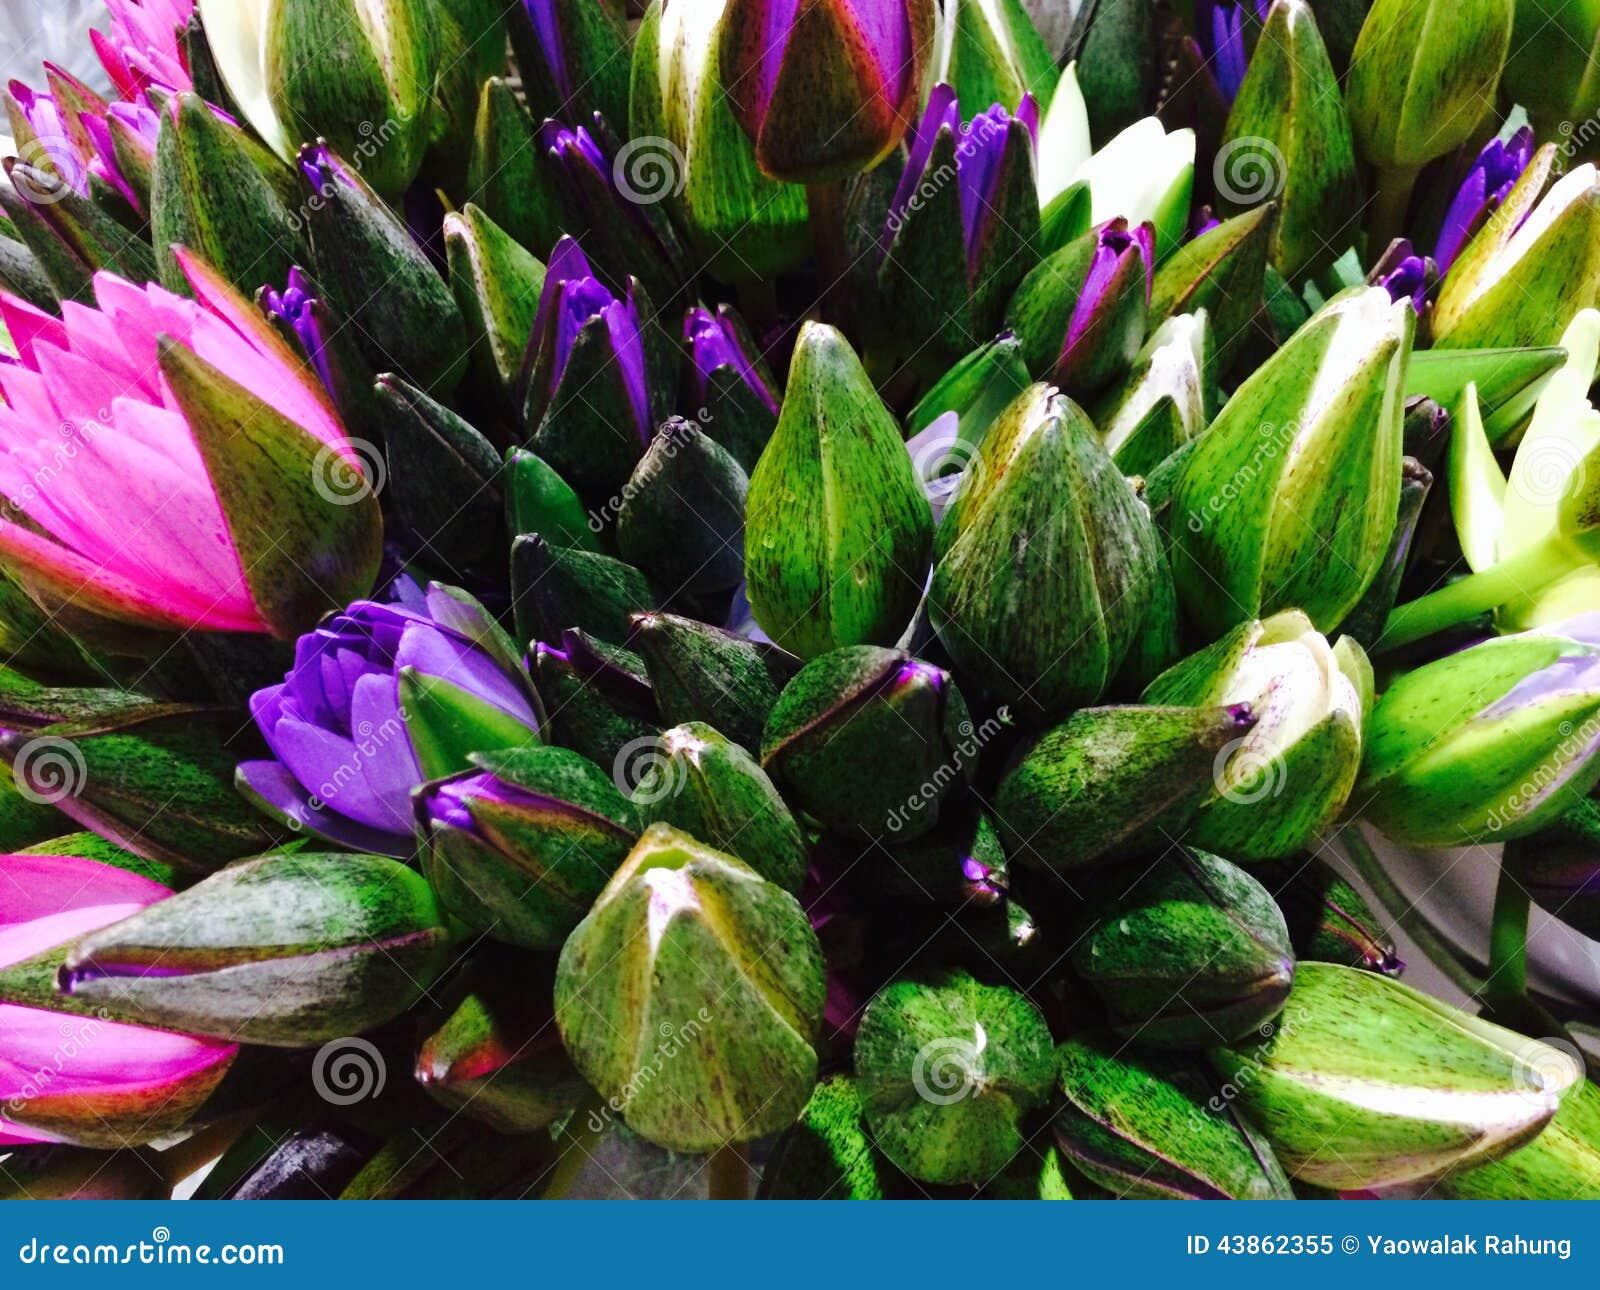 Thai Lotus Flower Stock Image Image Of Tree Garden 43862355